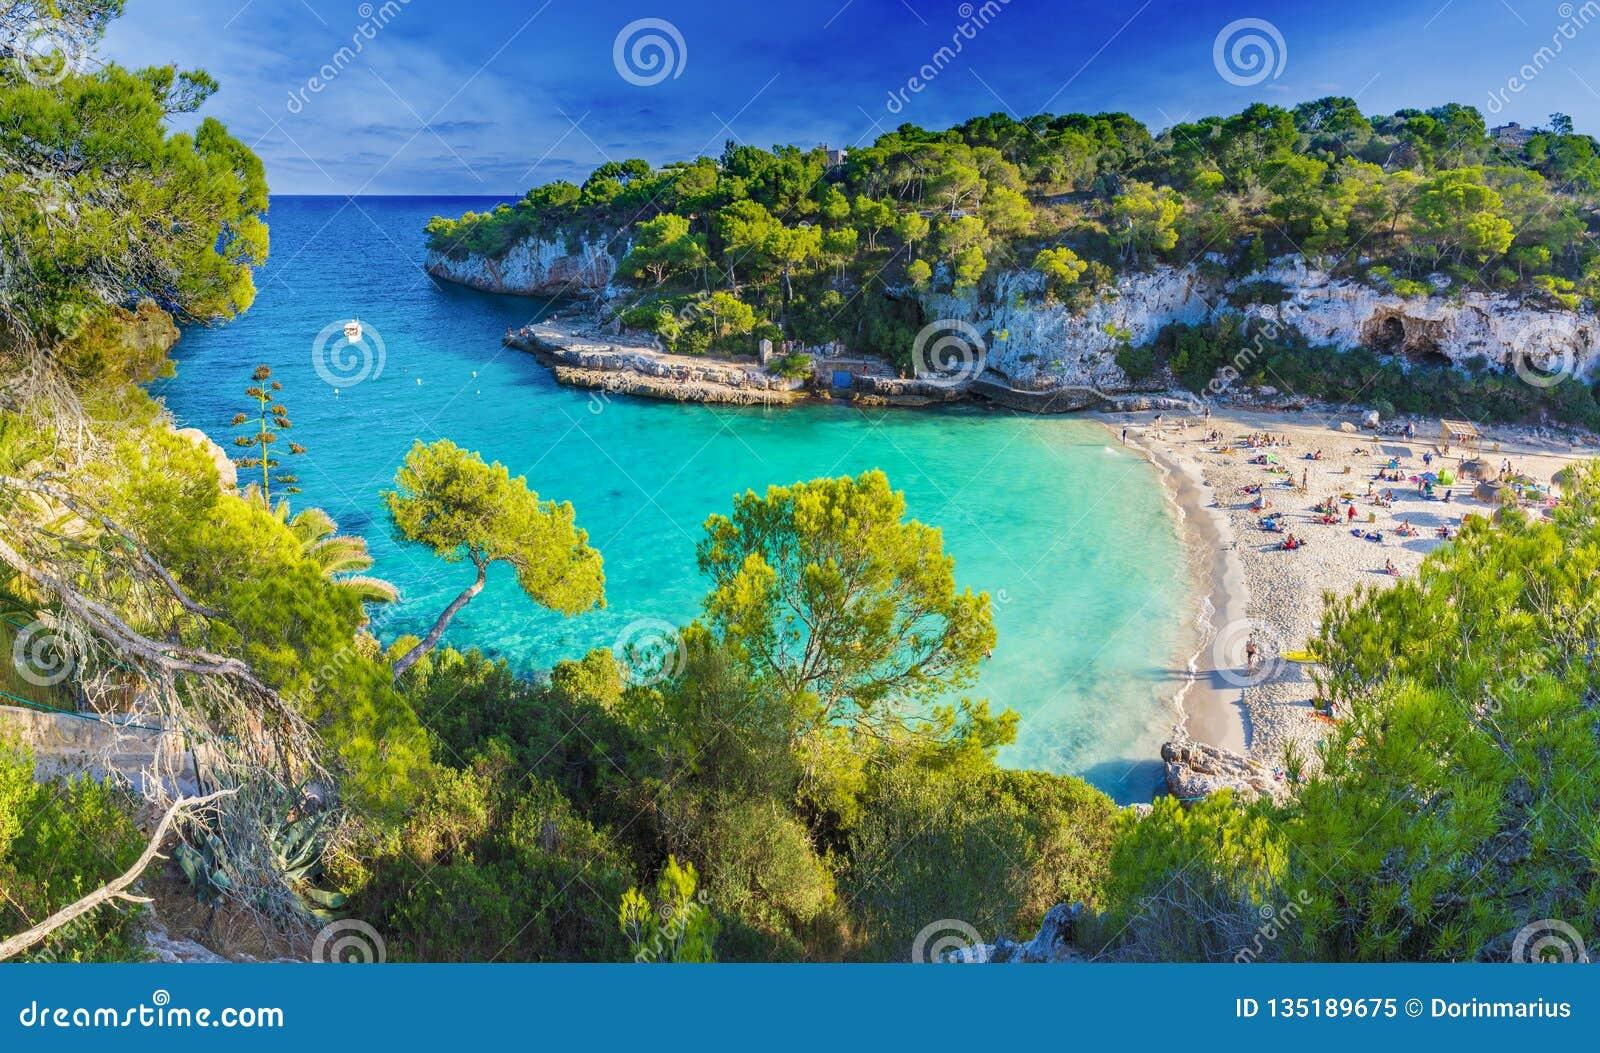 Playa de Mazing en Cala Llombards, isla de Majorca, España